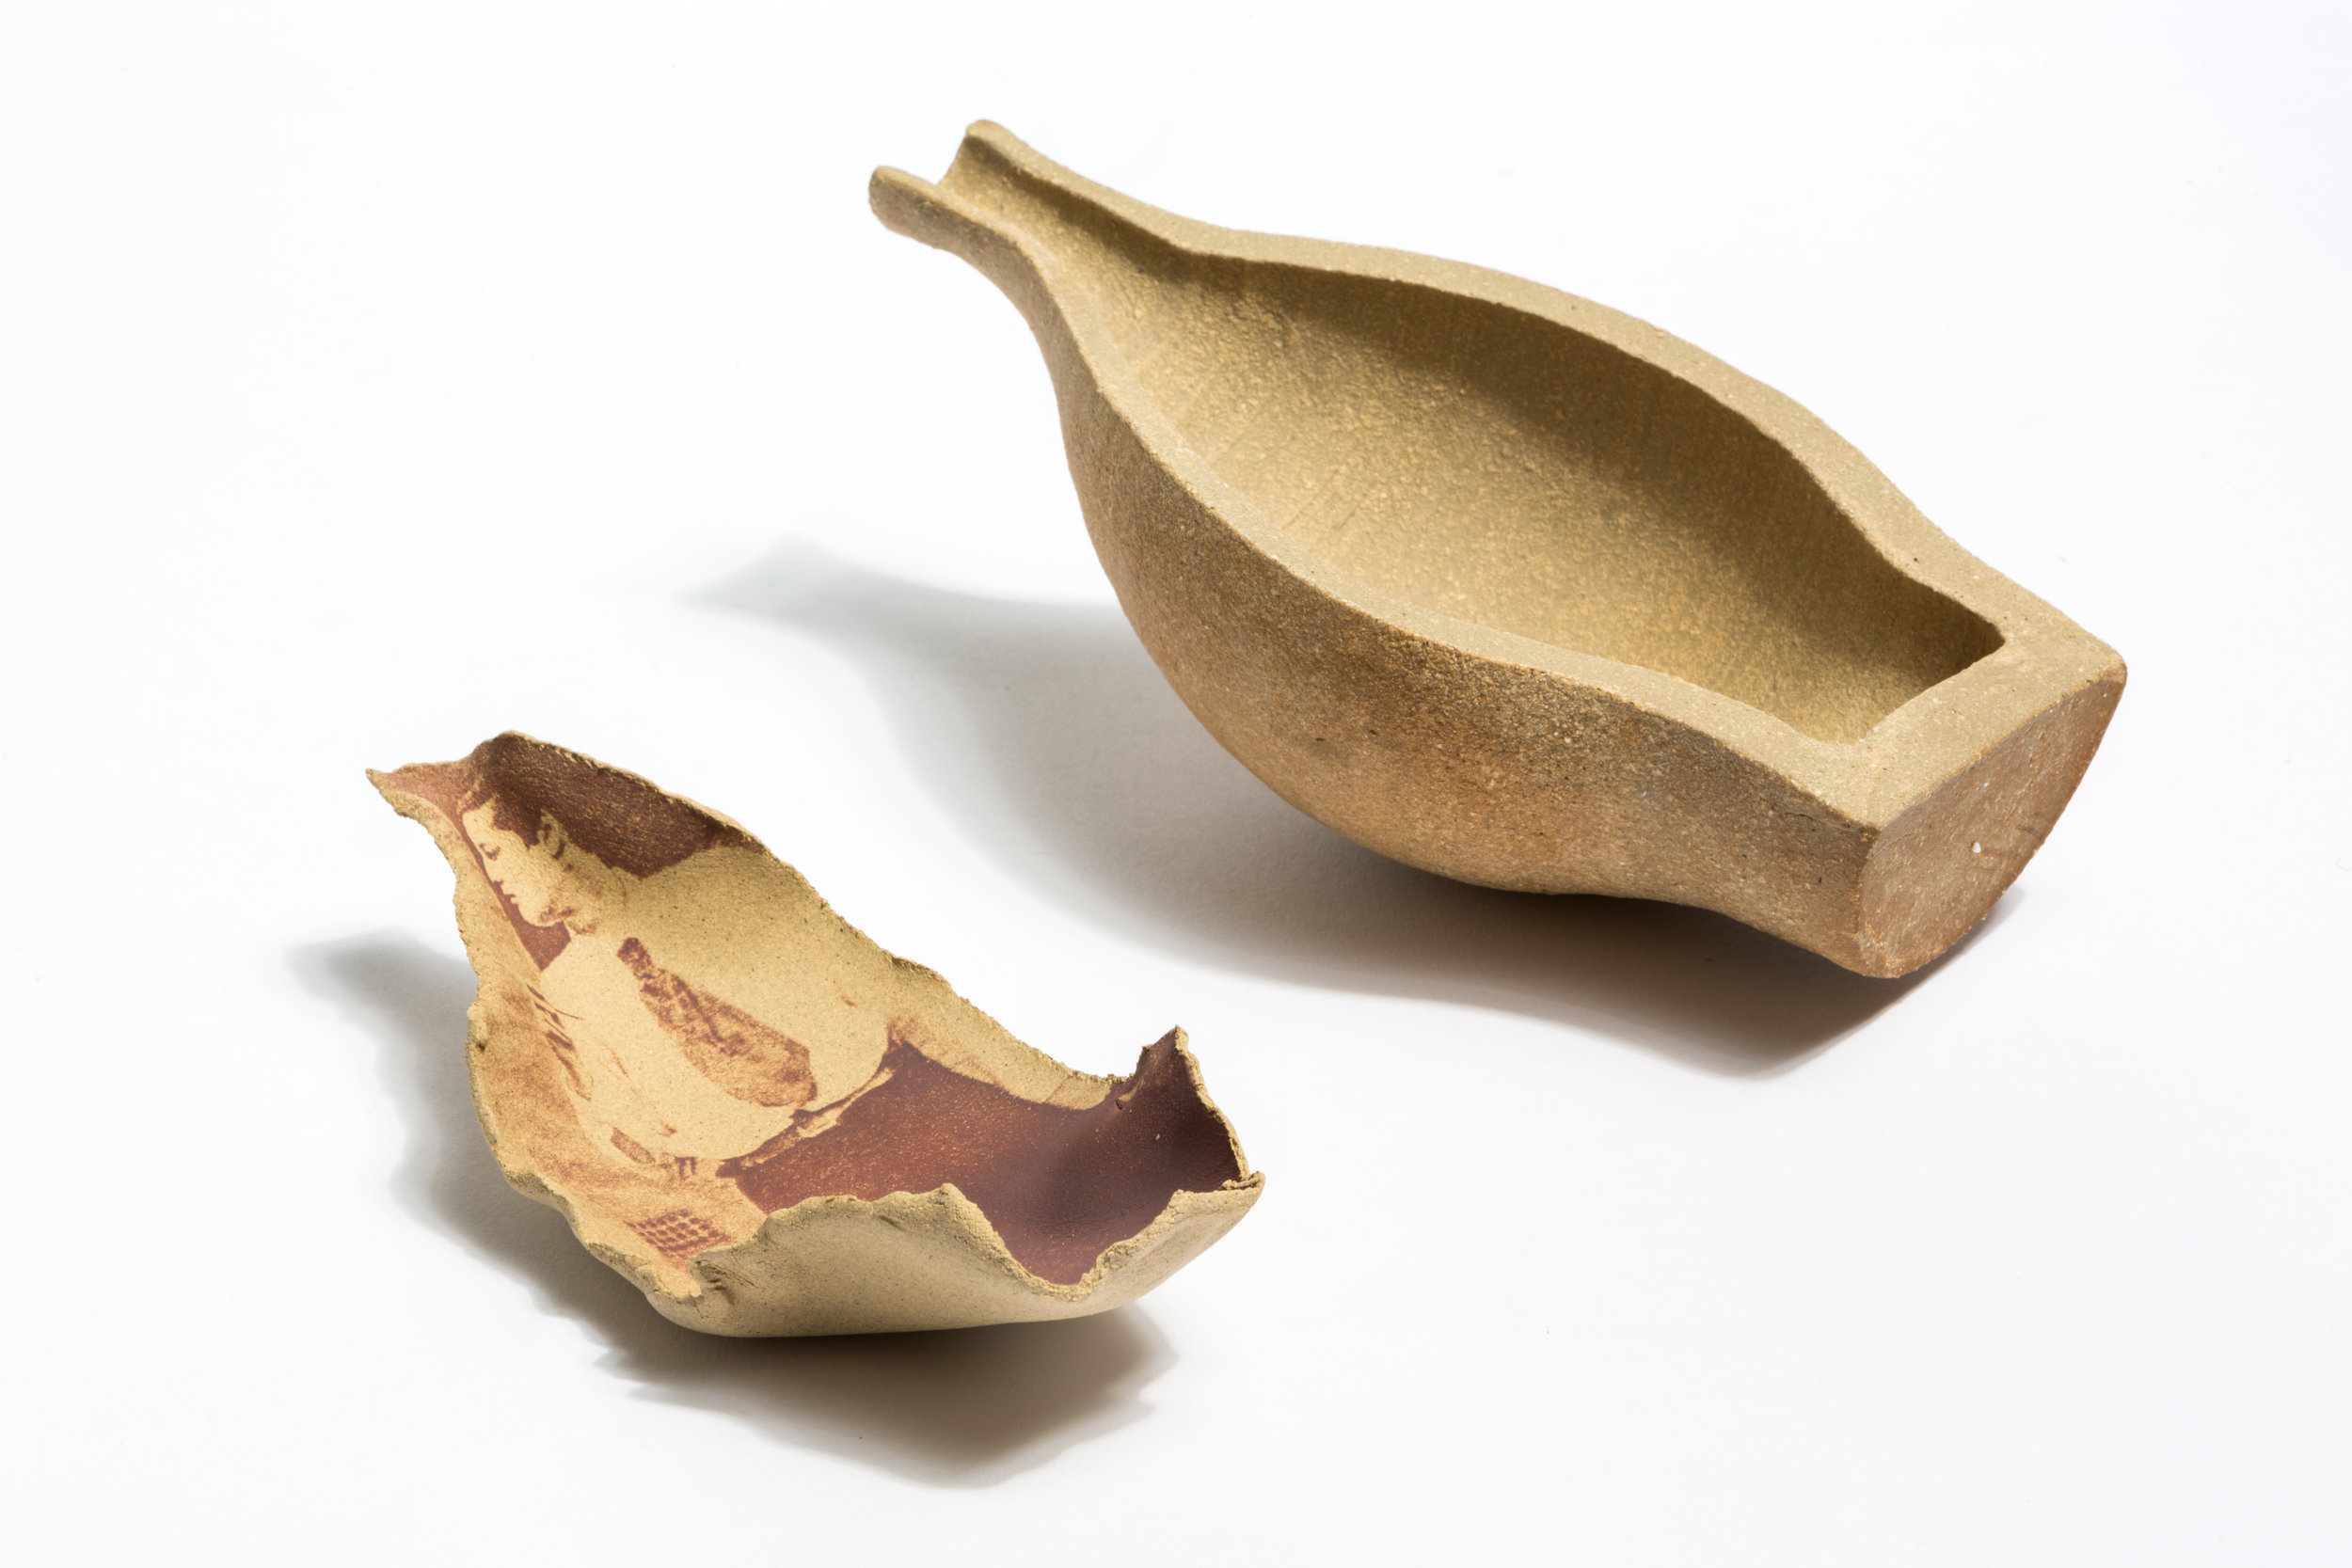 Inured, 2015, 21 x 20, Ceramic vessel and photocopy print.